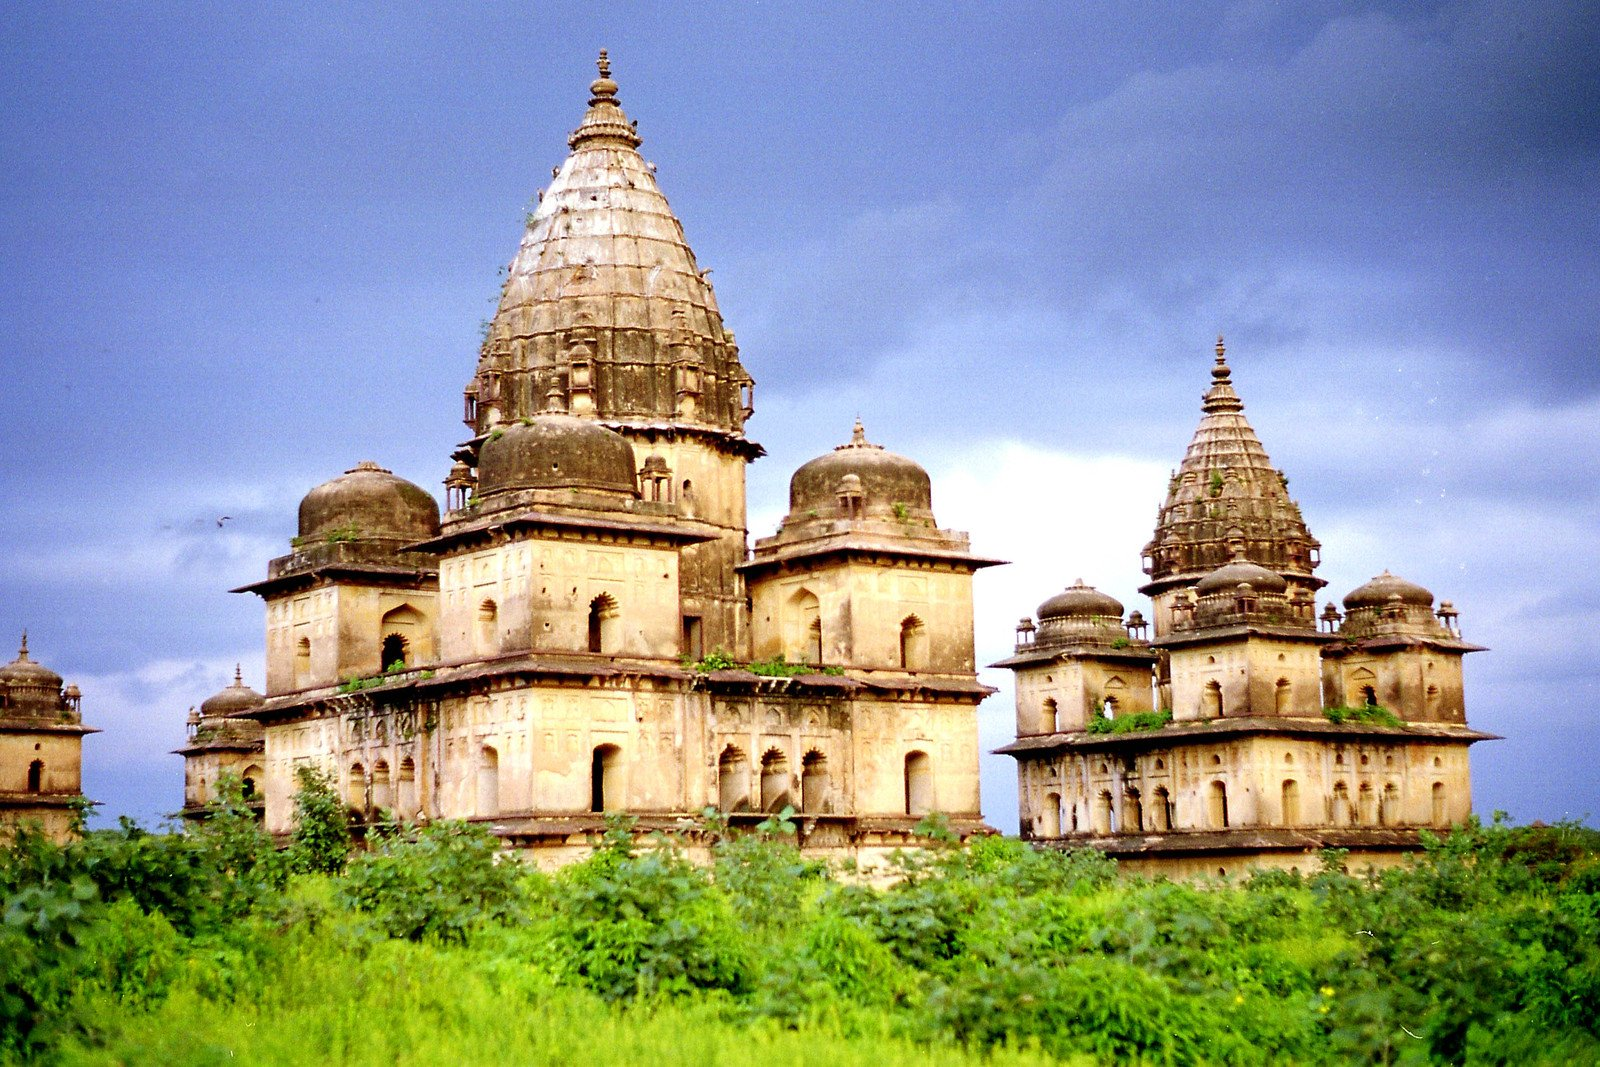 Chhattris in Orchha